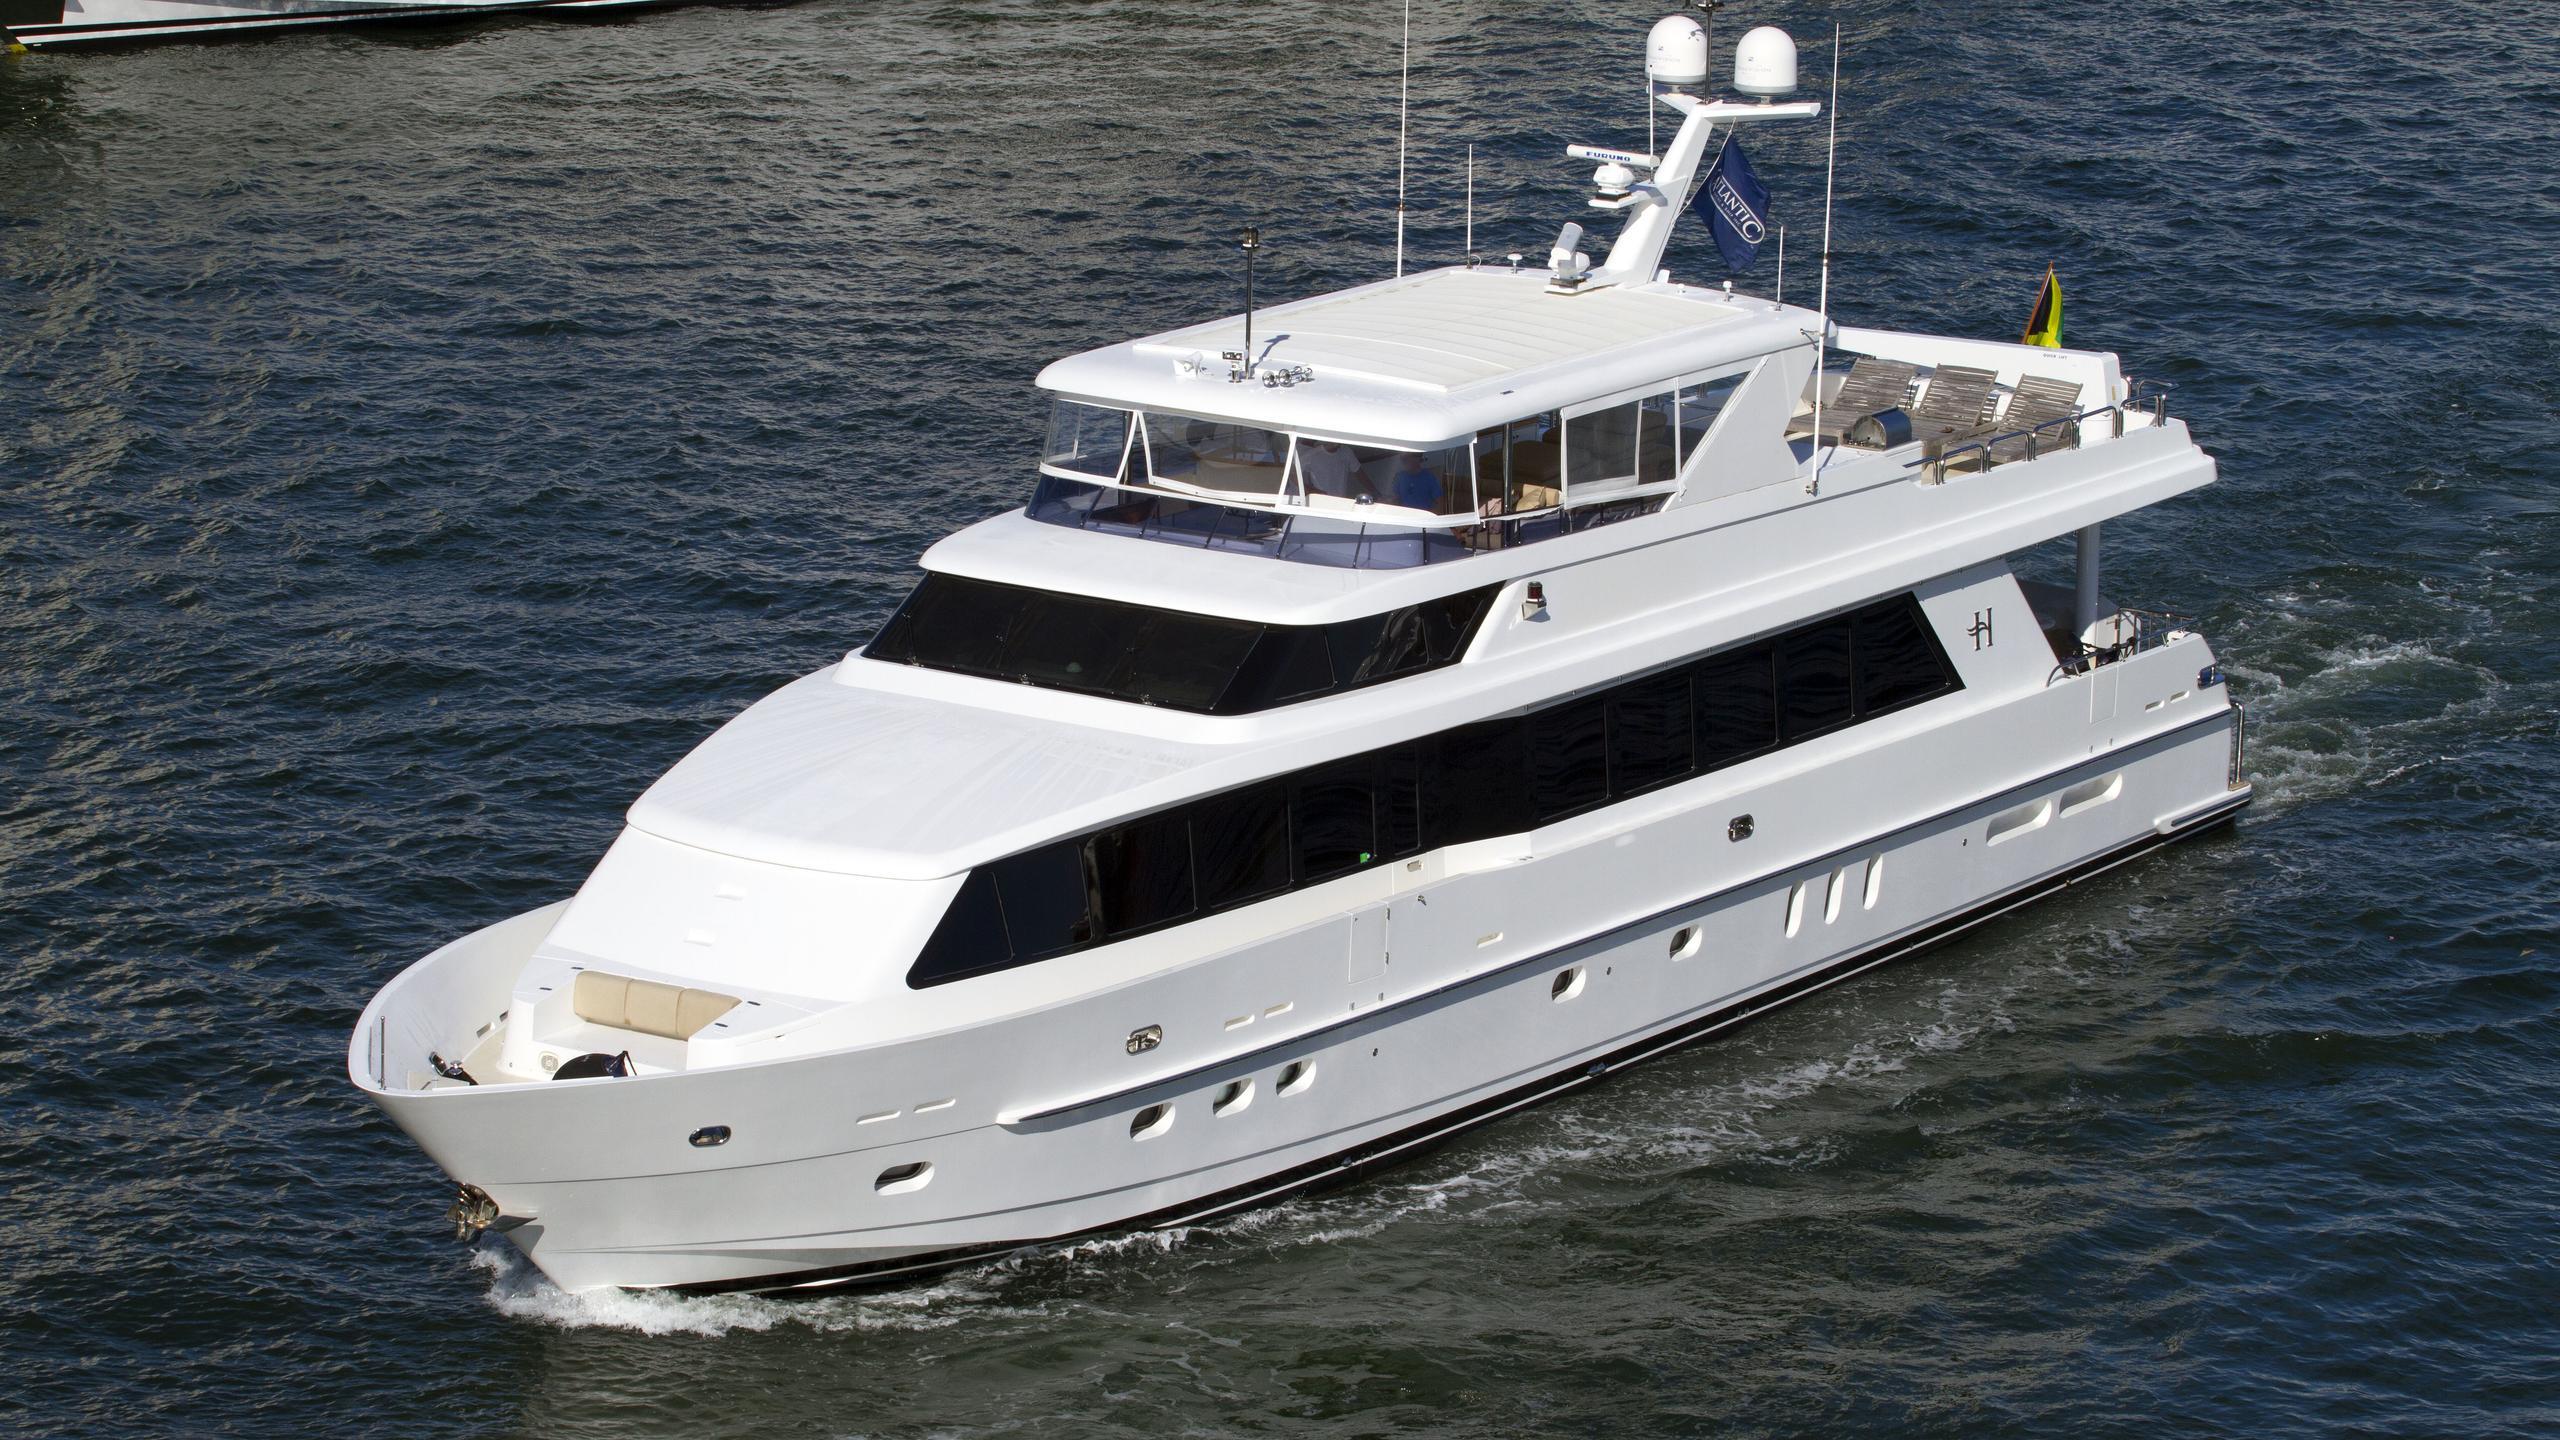 cameron alexander forever clarity motor yacht kha shing hargrave 101 2010 31m half profile